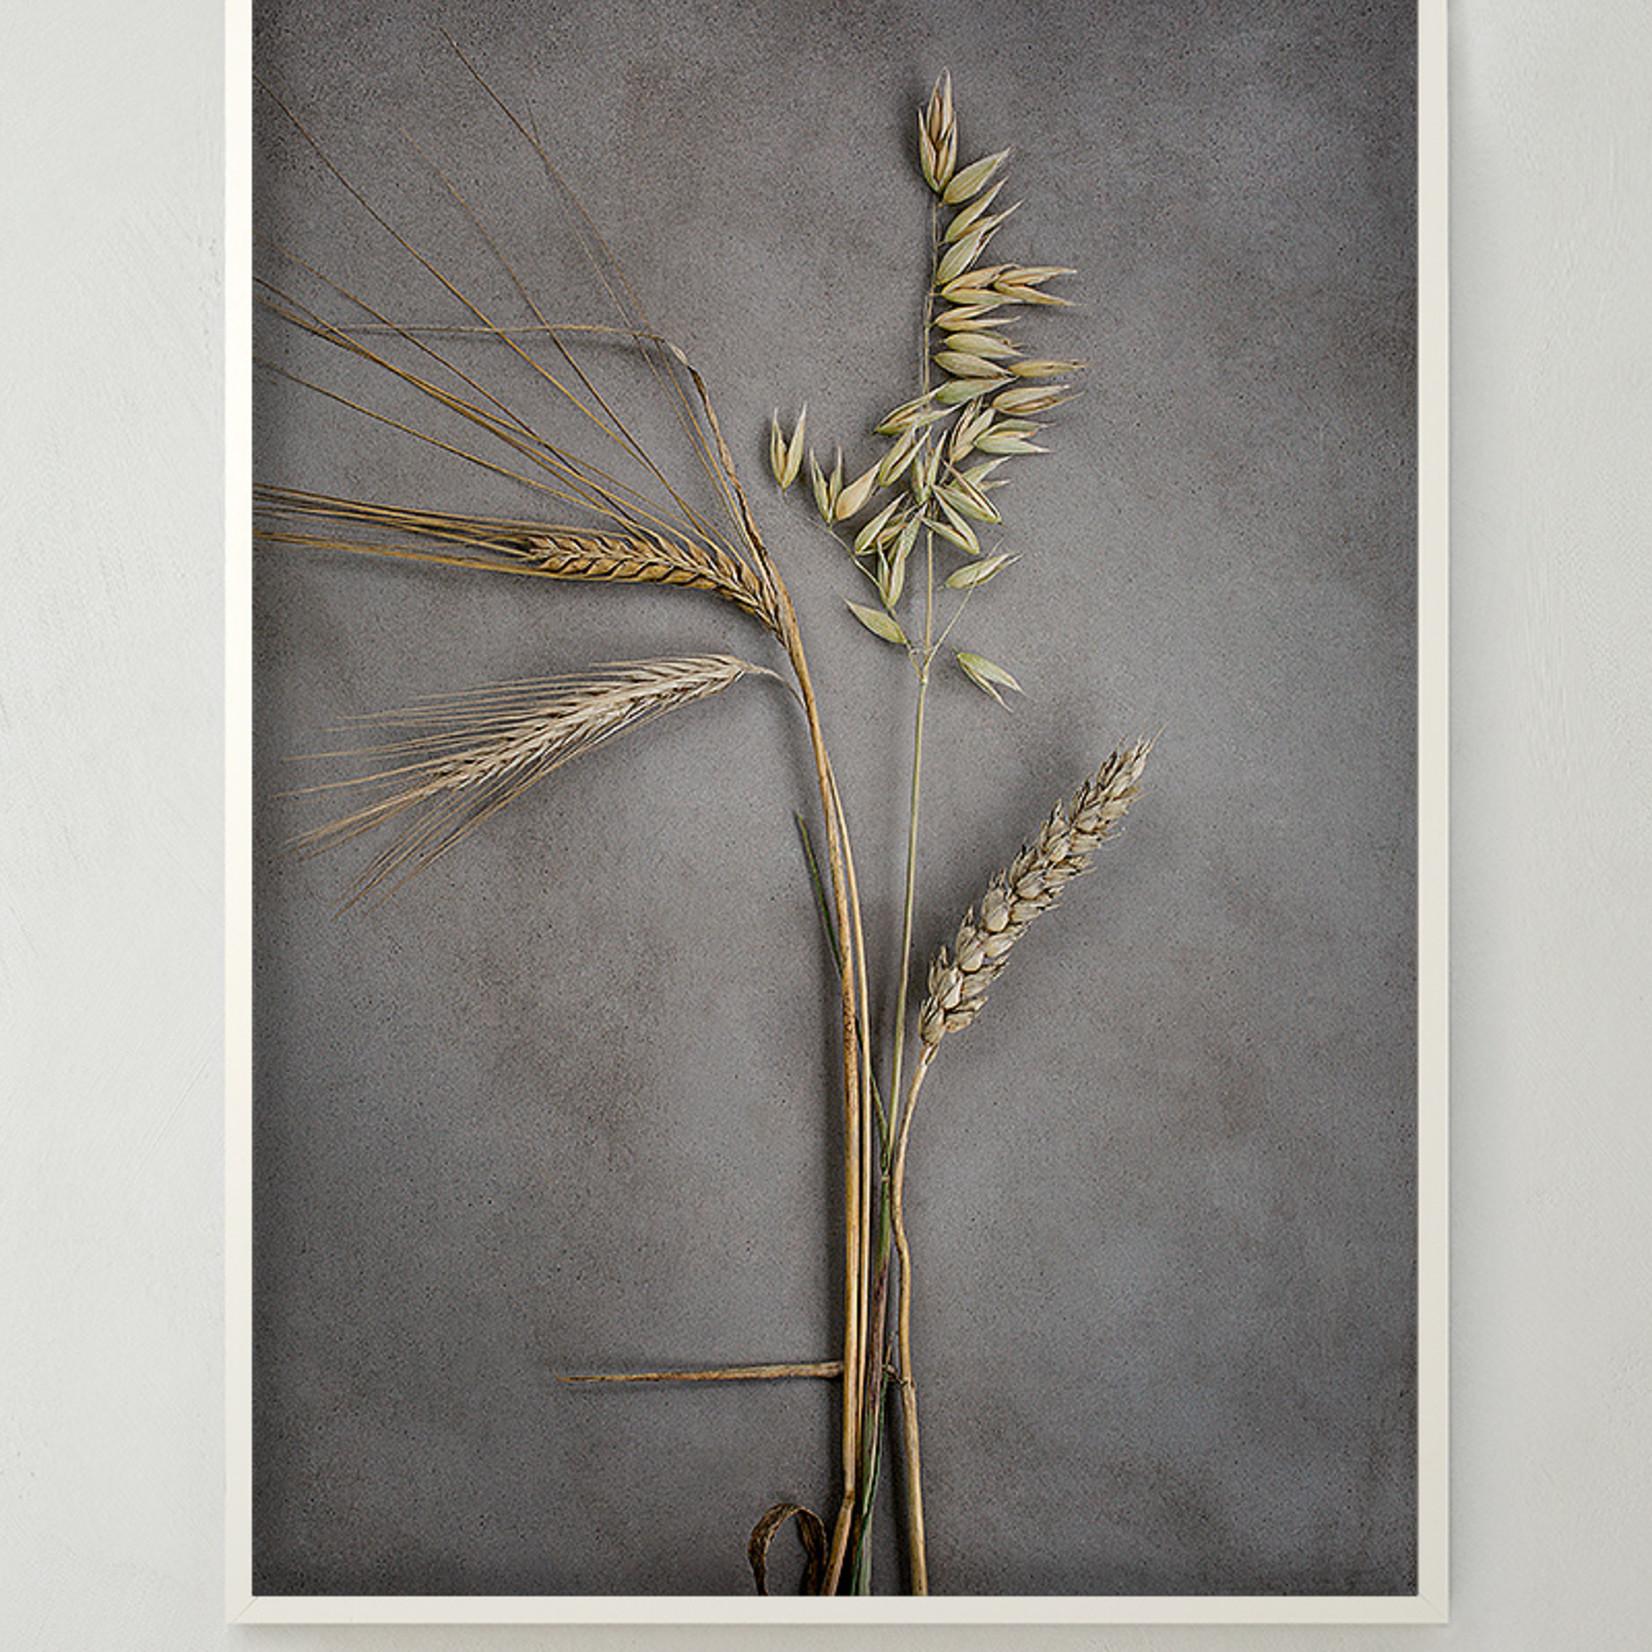 Storefactory  Poster Four Grains